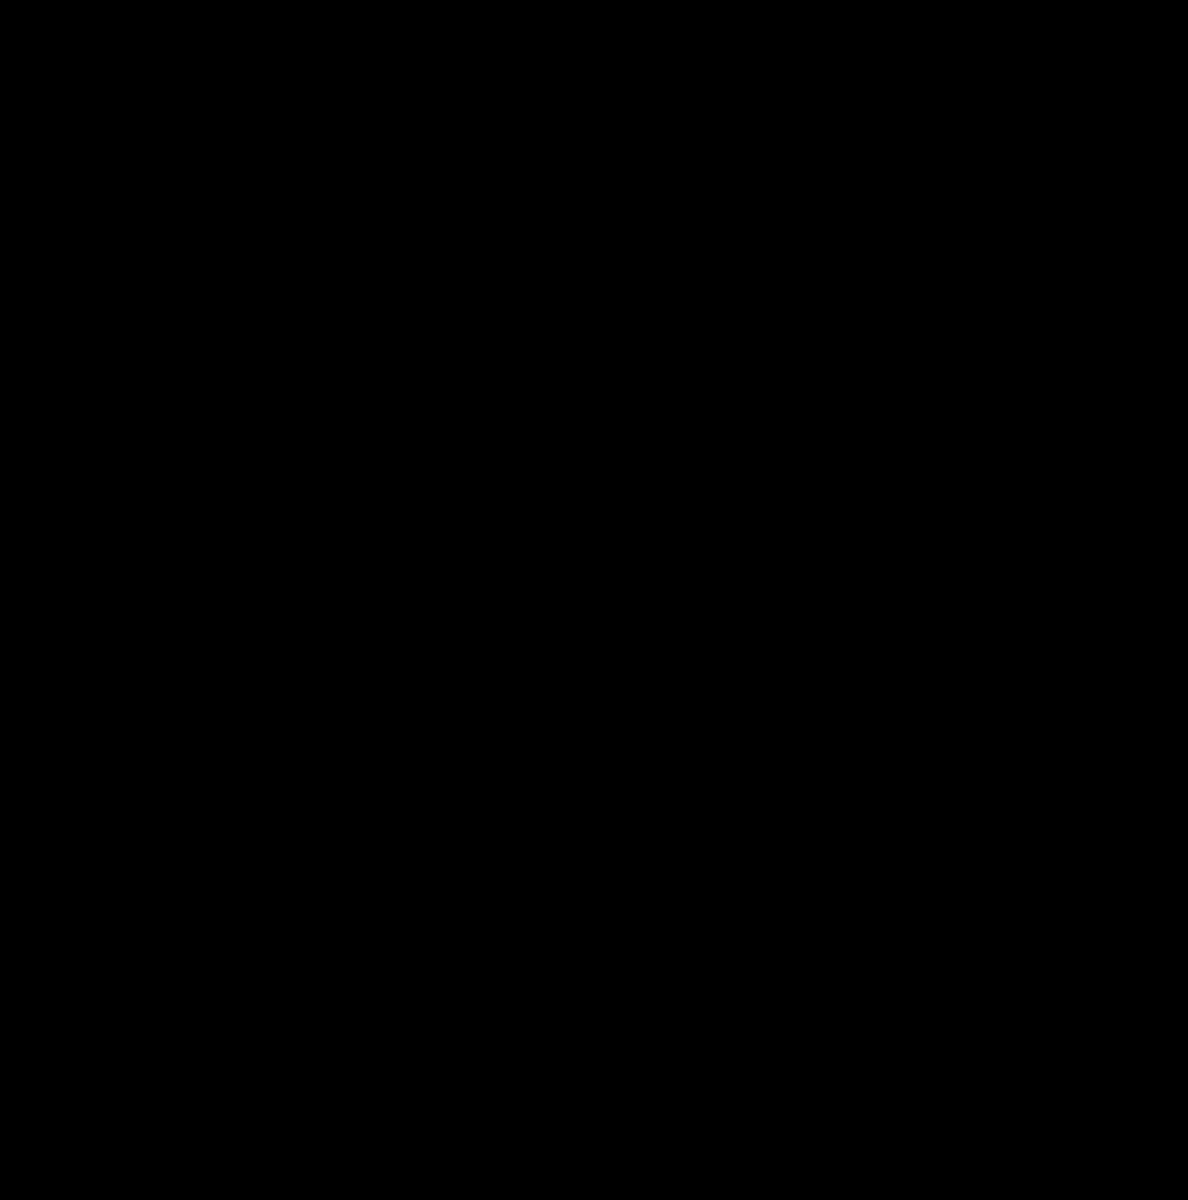 Cera4line Mento Belga Blu Scuro | 60X60X4cm